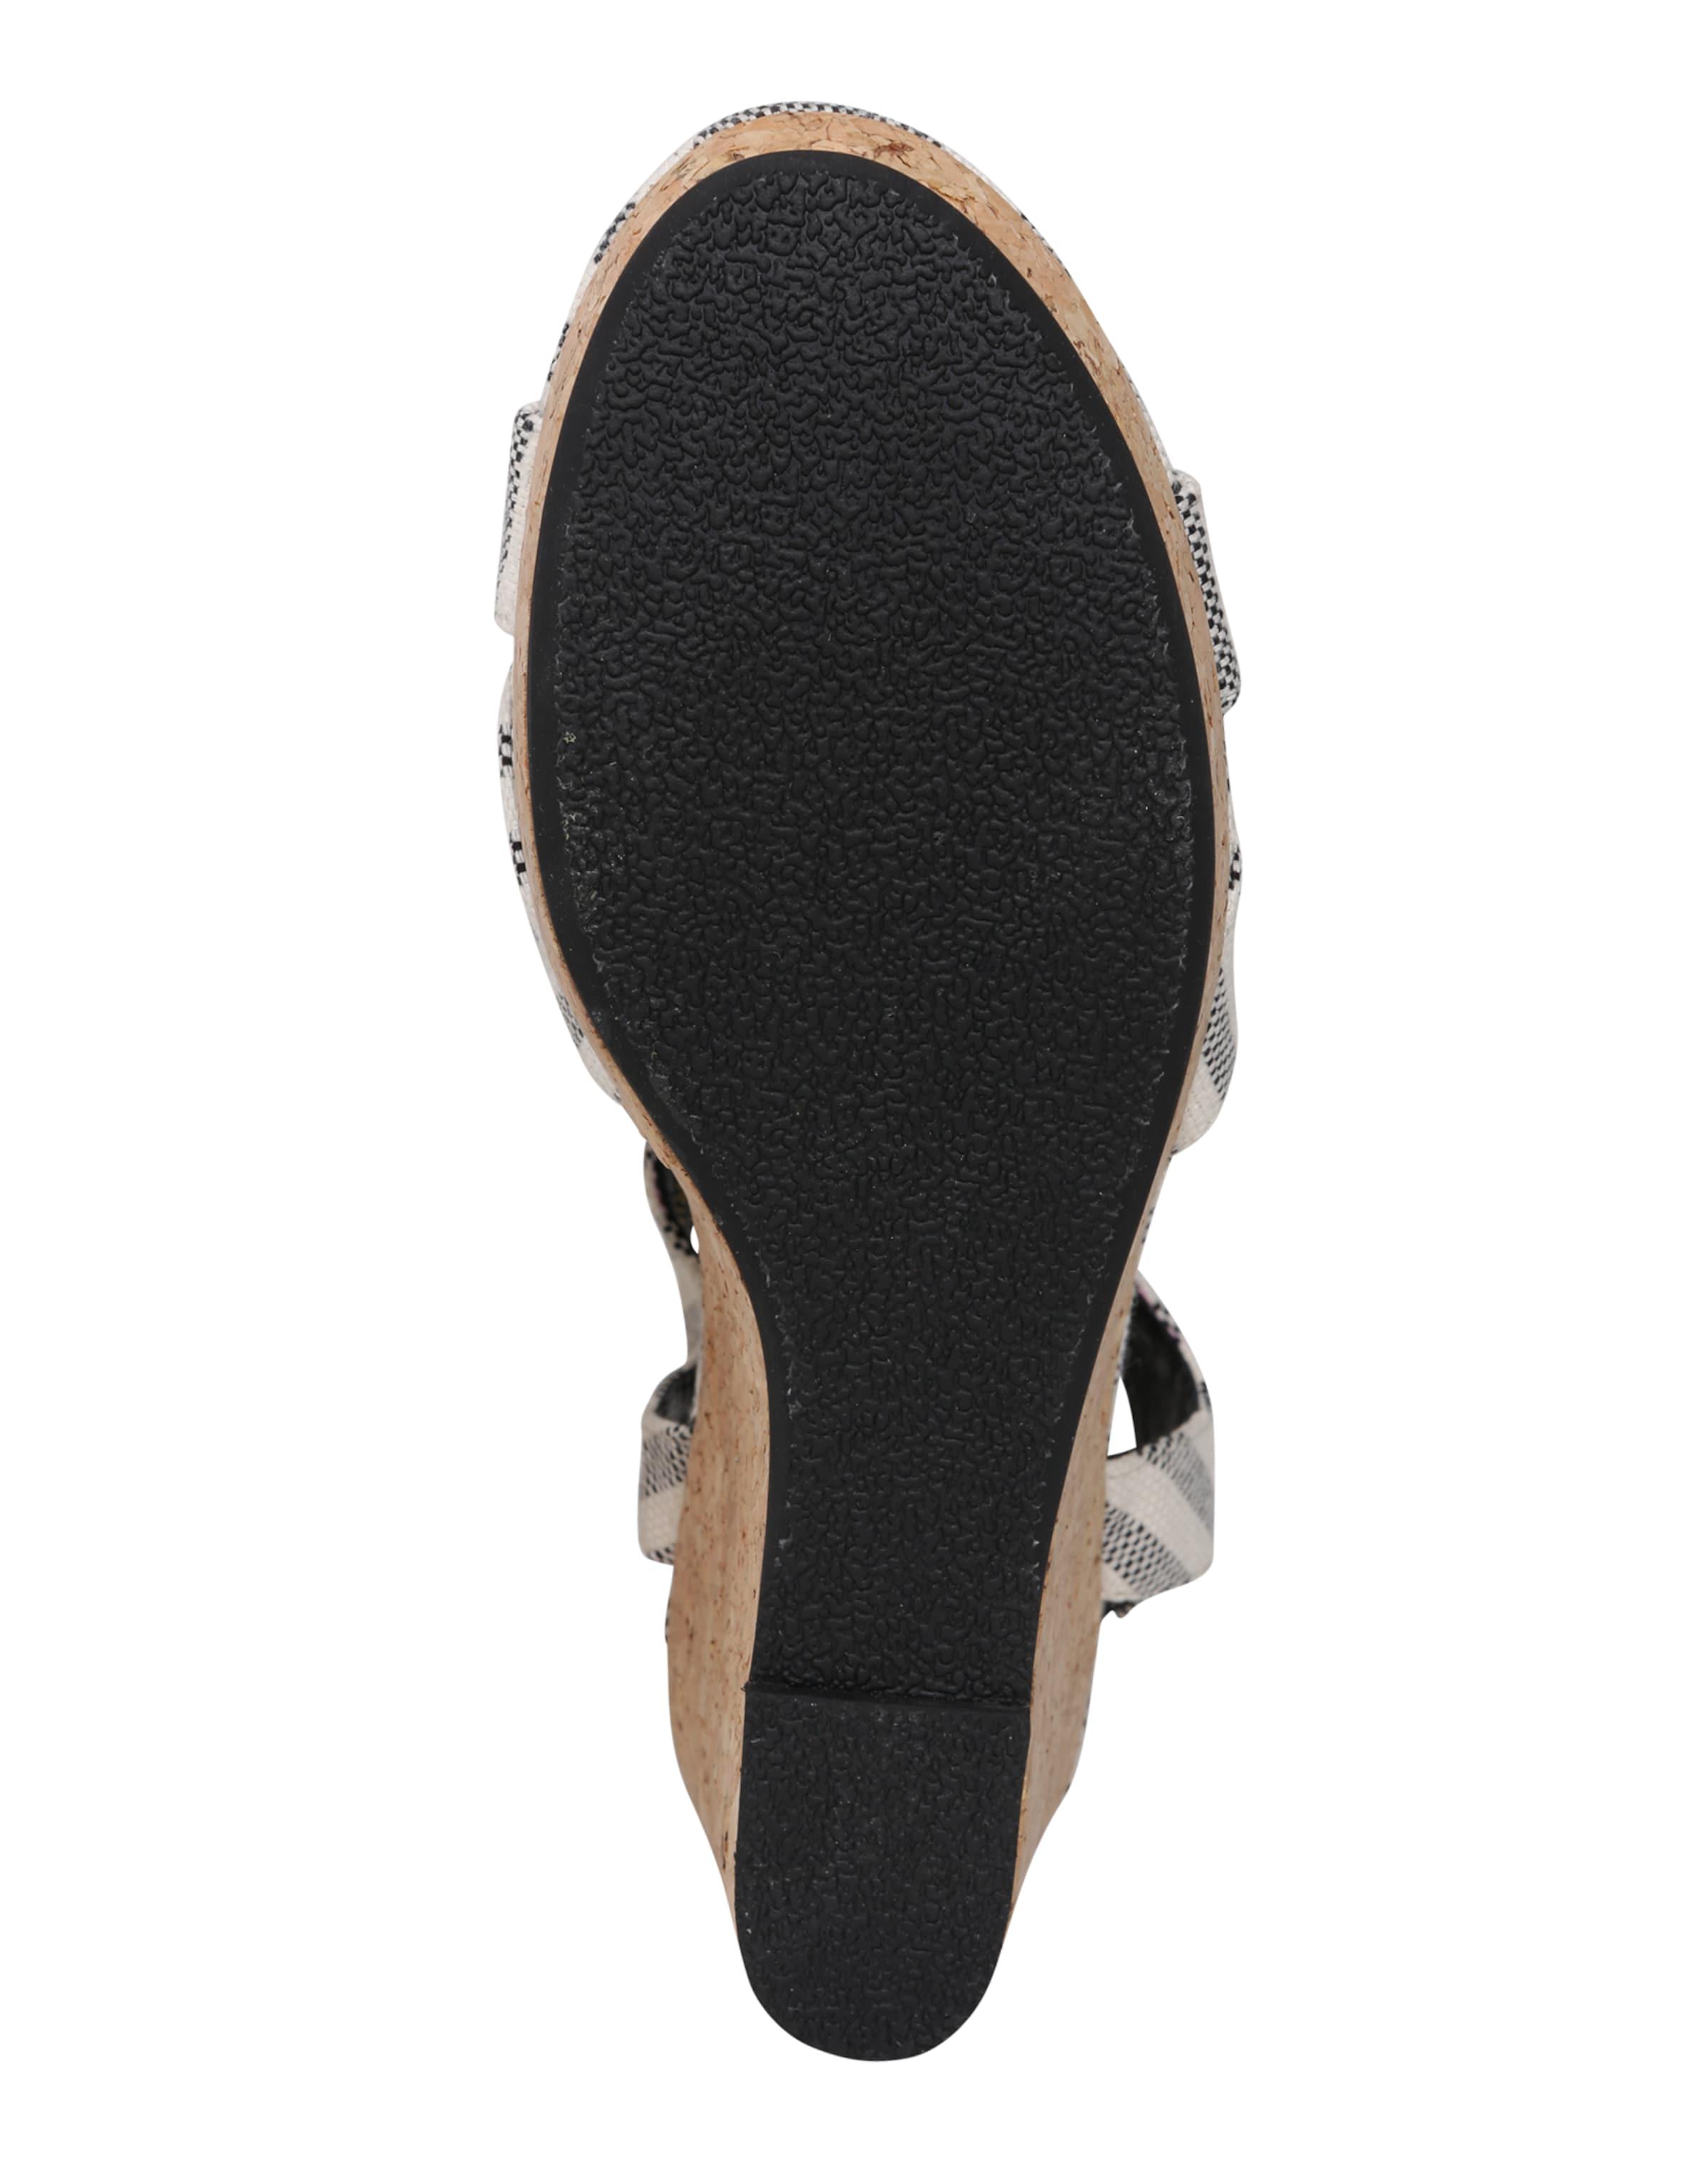 Schuhe The Bear Wedgesandalen Stripe 'Alec Stripe Wedgesandalen Polyurethan Billige Herren- und Damenschuhe 65d7e4